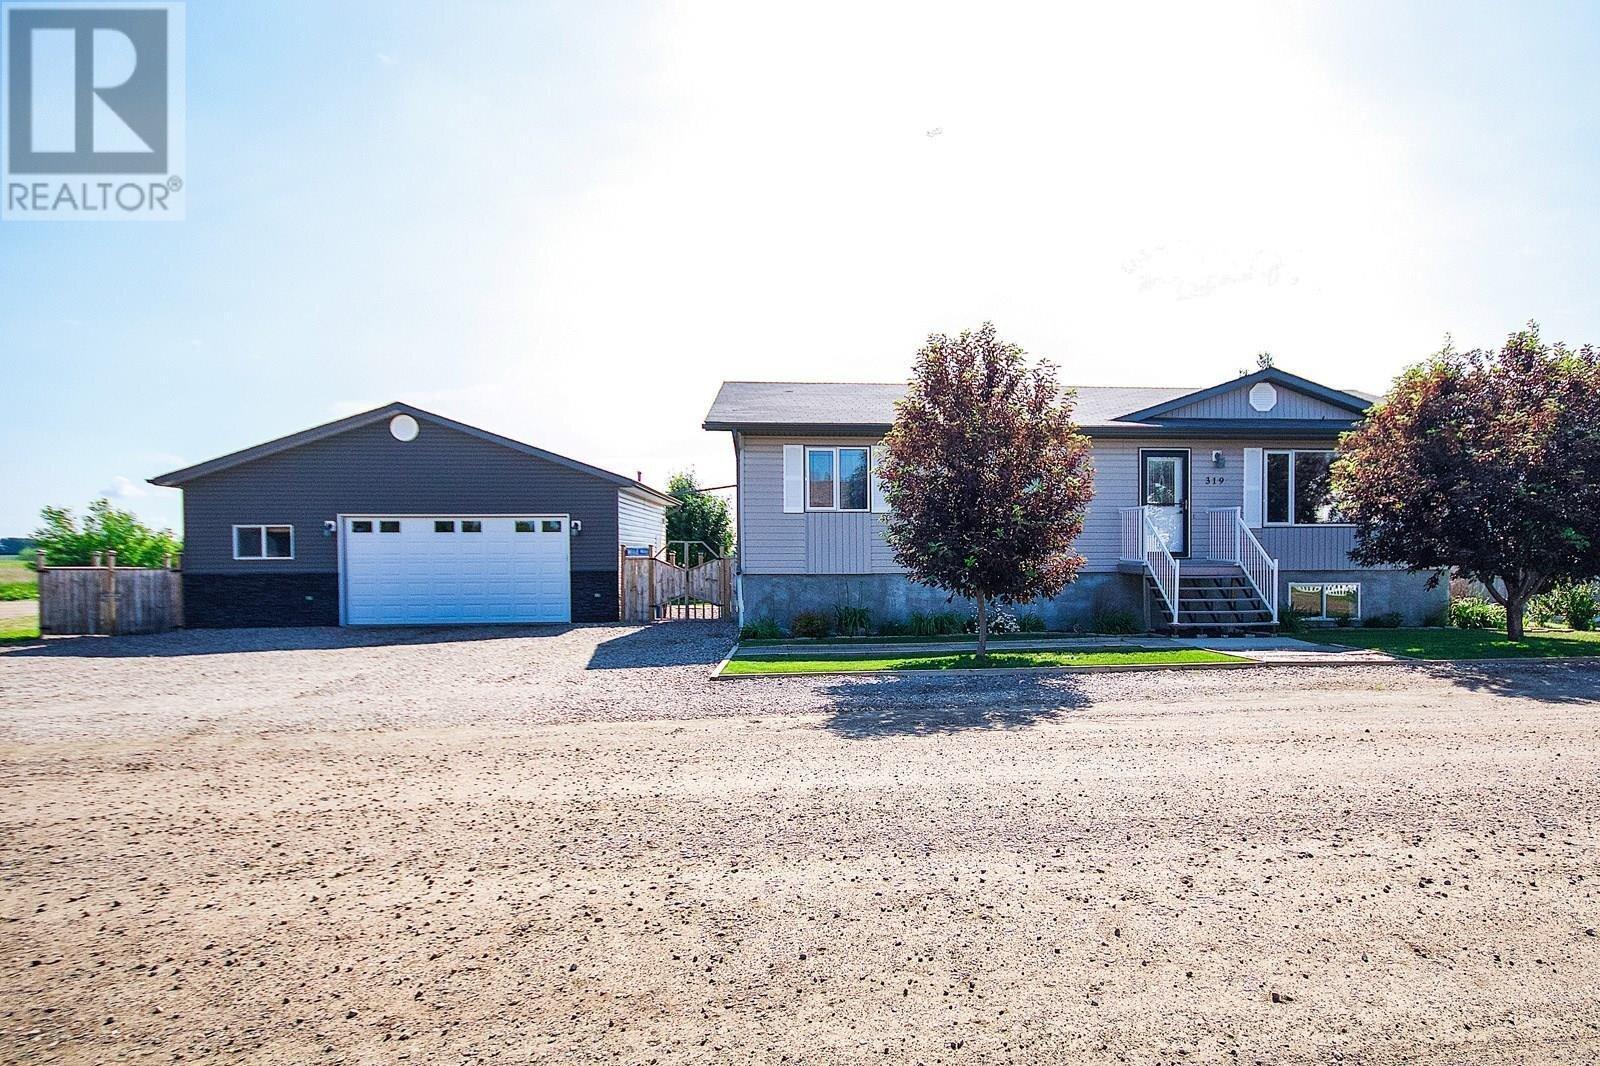 House for sale at 319 Archibald St Midale Saskatchewan - MLS: SK819557